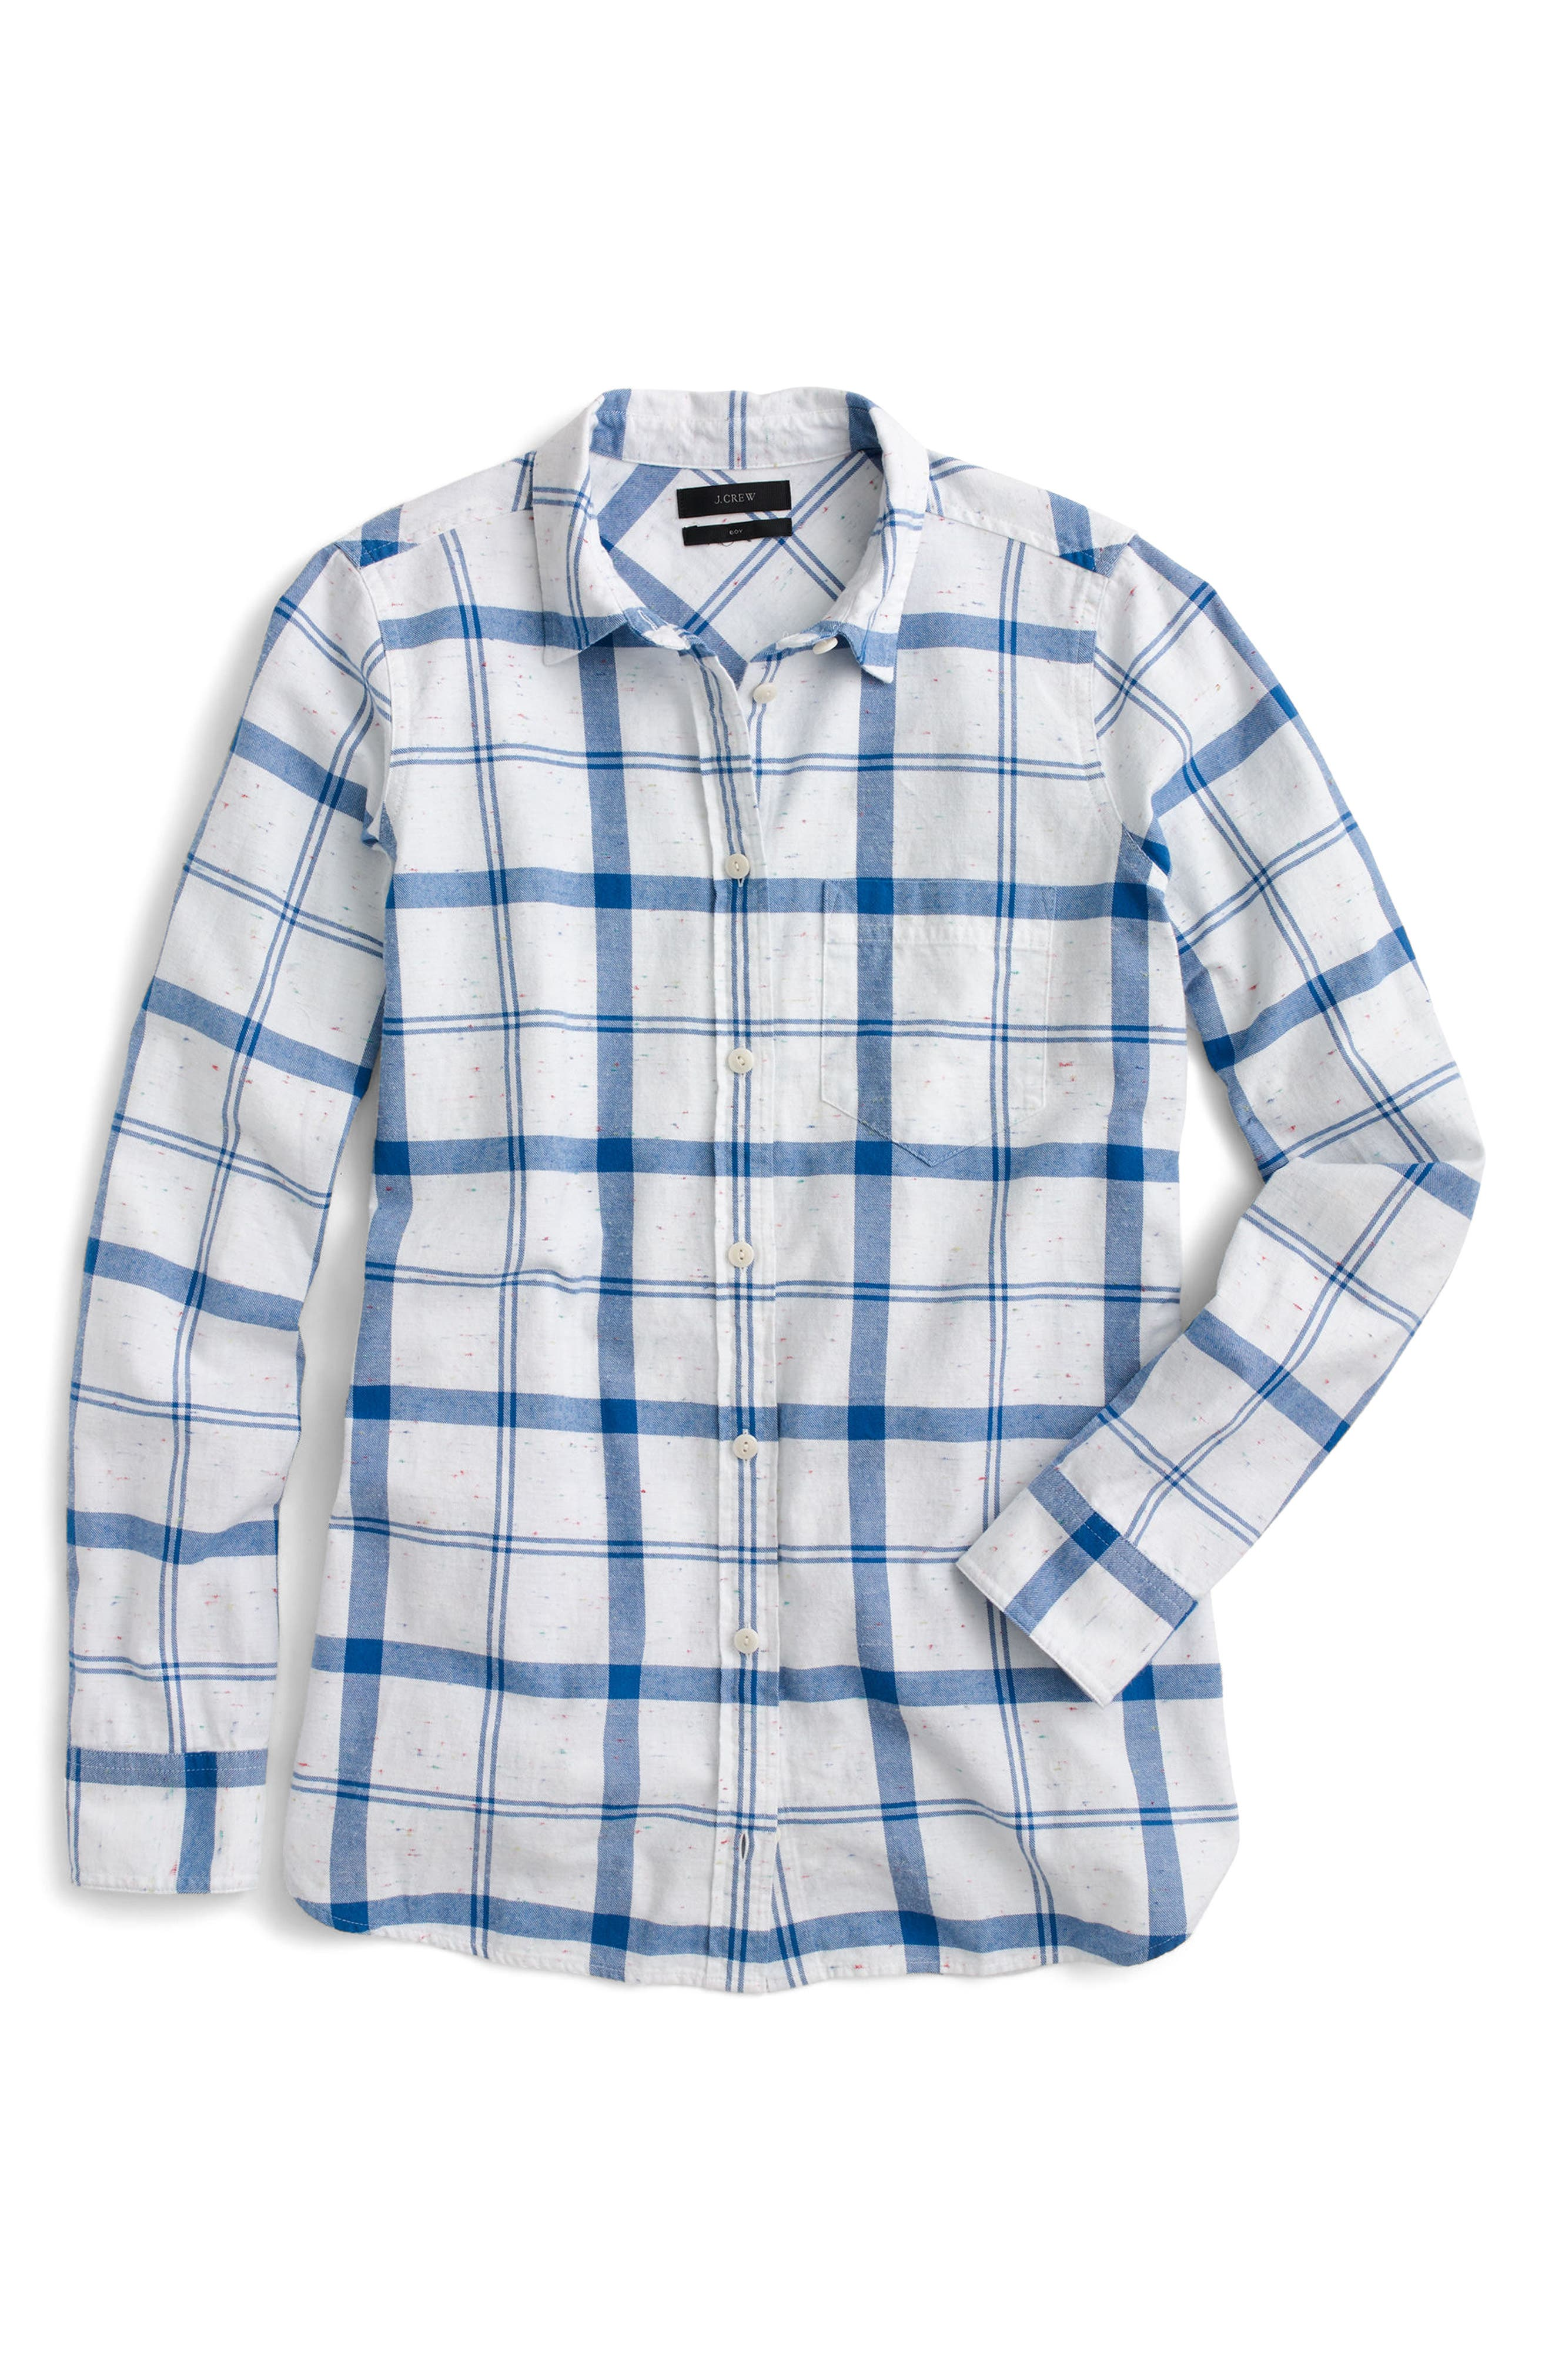 J.Crew Confetti Plaid Boy Shirt,                             Alternate thumbnail 4, color,                             White Blue